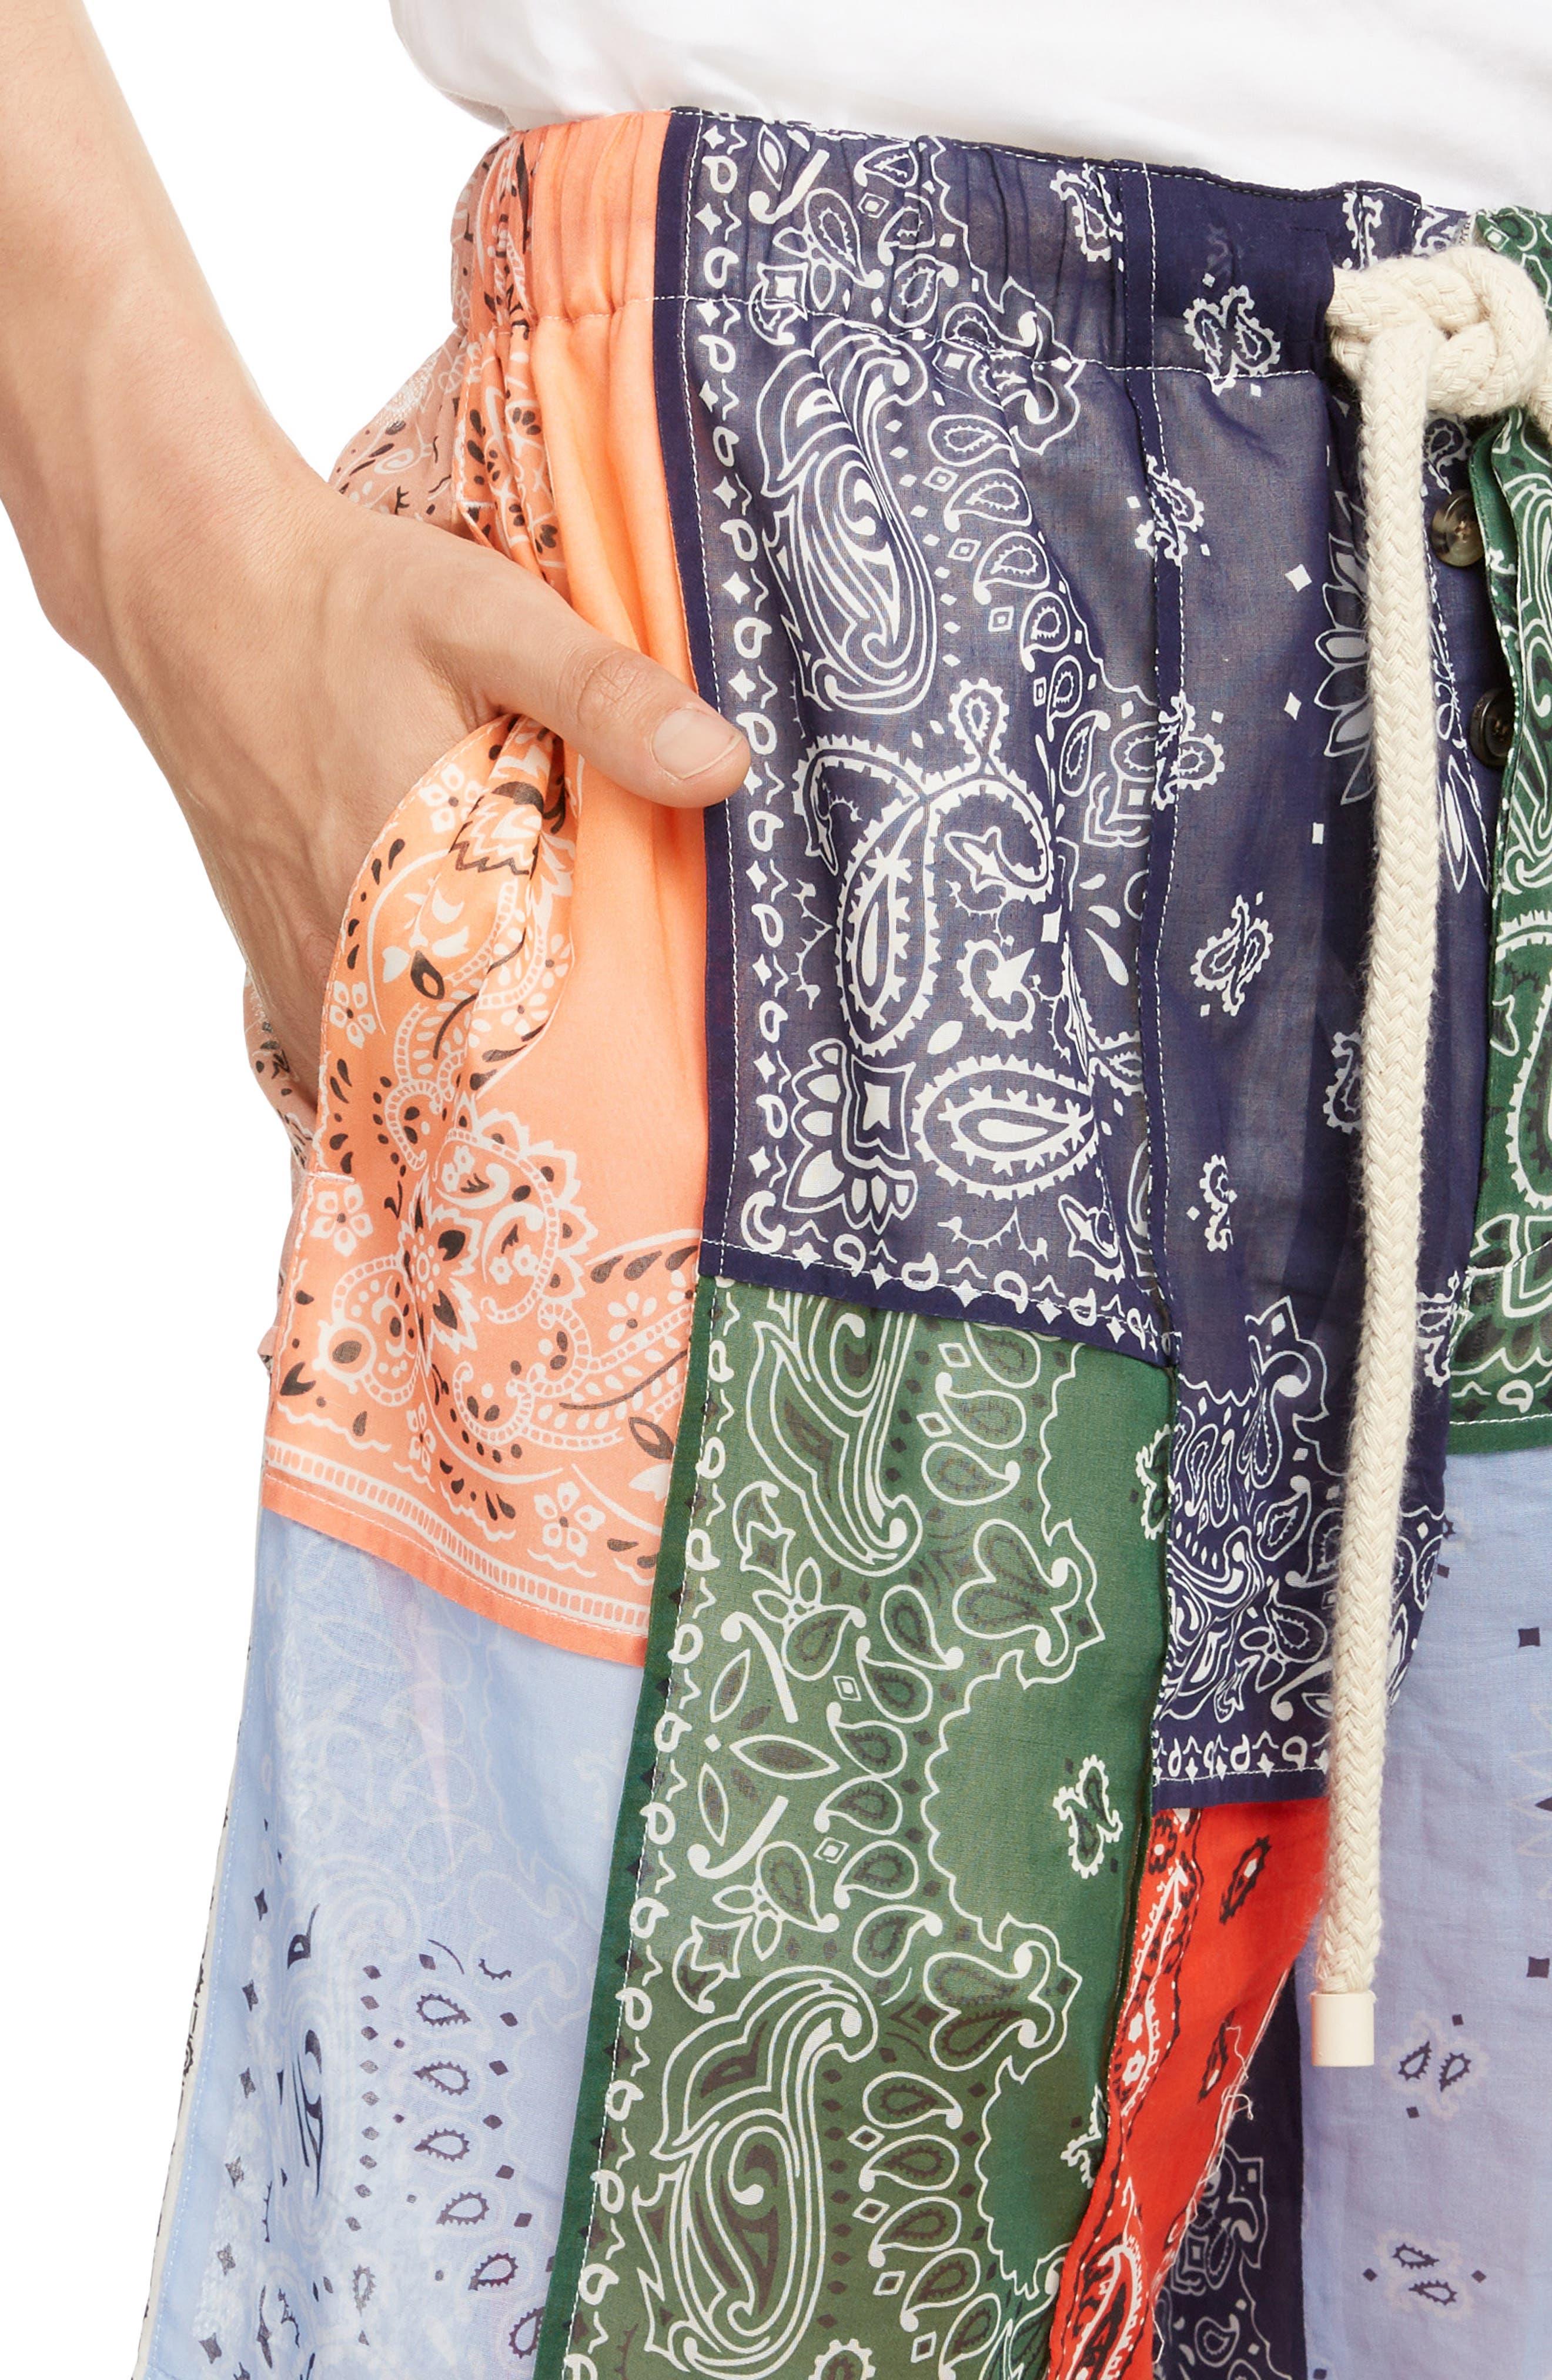 LOEWE, Bandana Patchwork Shorts, Alternate thumbnail 4, color, 9990-MULTICOLOR